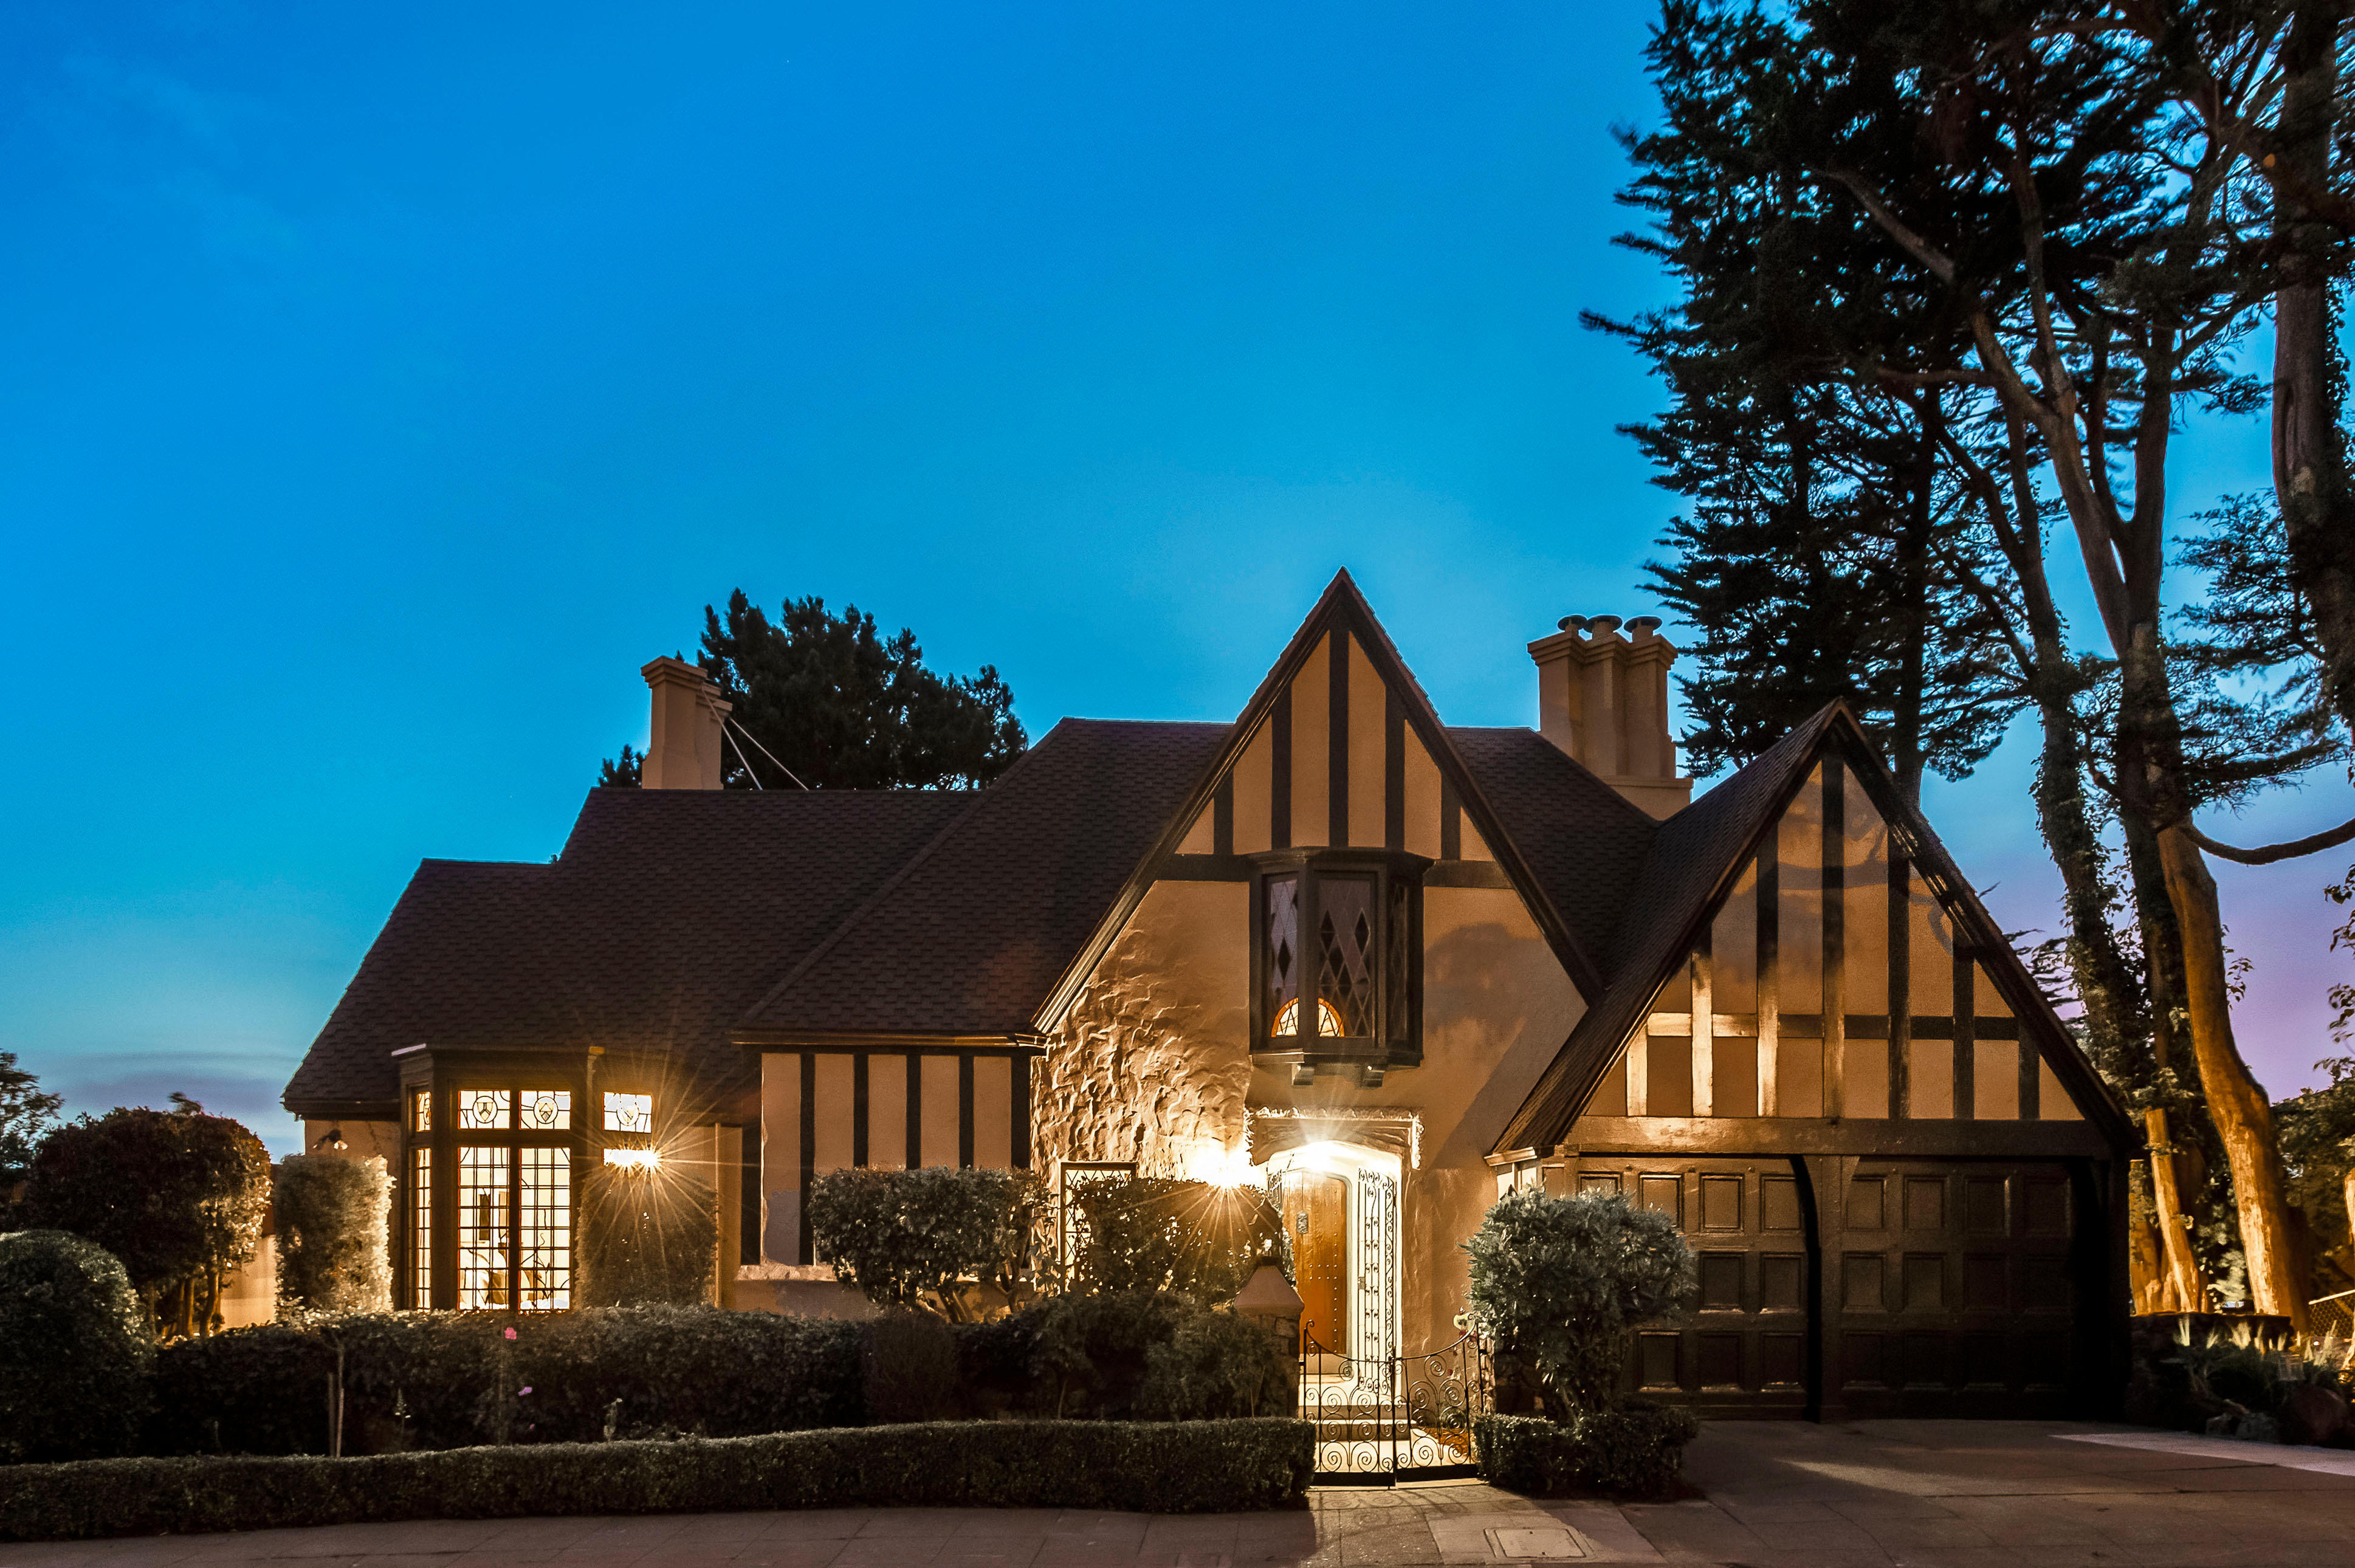 Robert R. Callan Jr. - McGuire Real Estate image 3